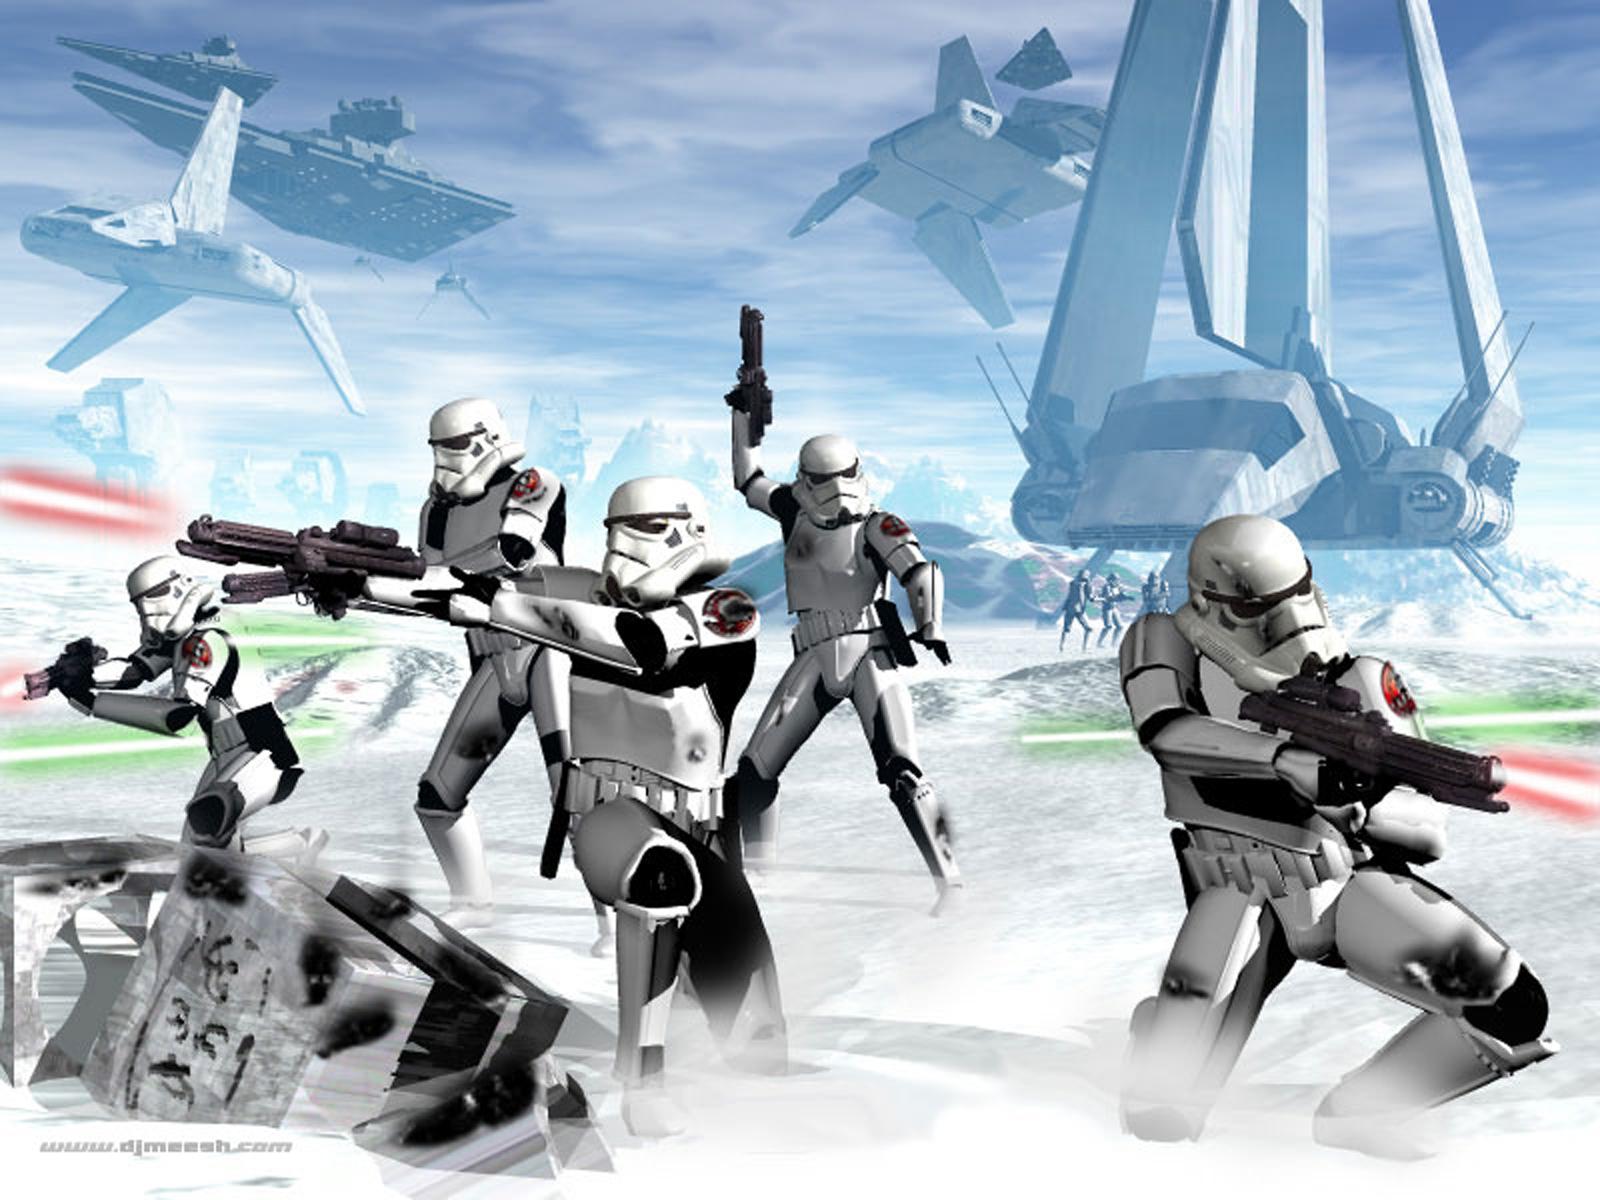 Stormtrooper Battle Artwork | www.imgkid.com - The Image ...